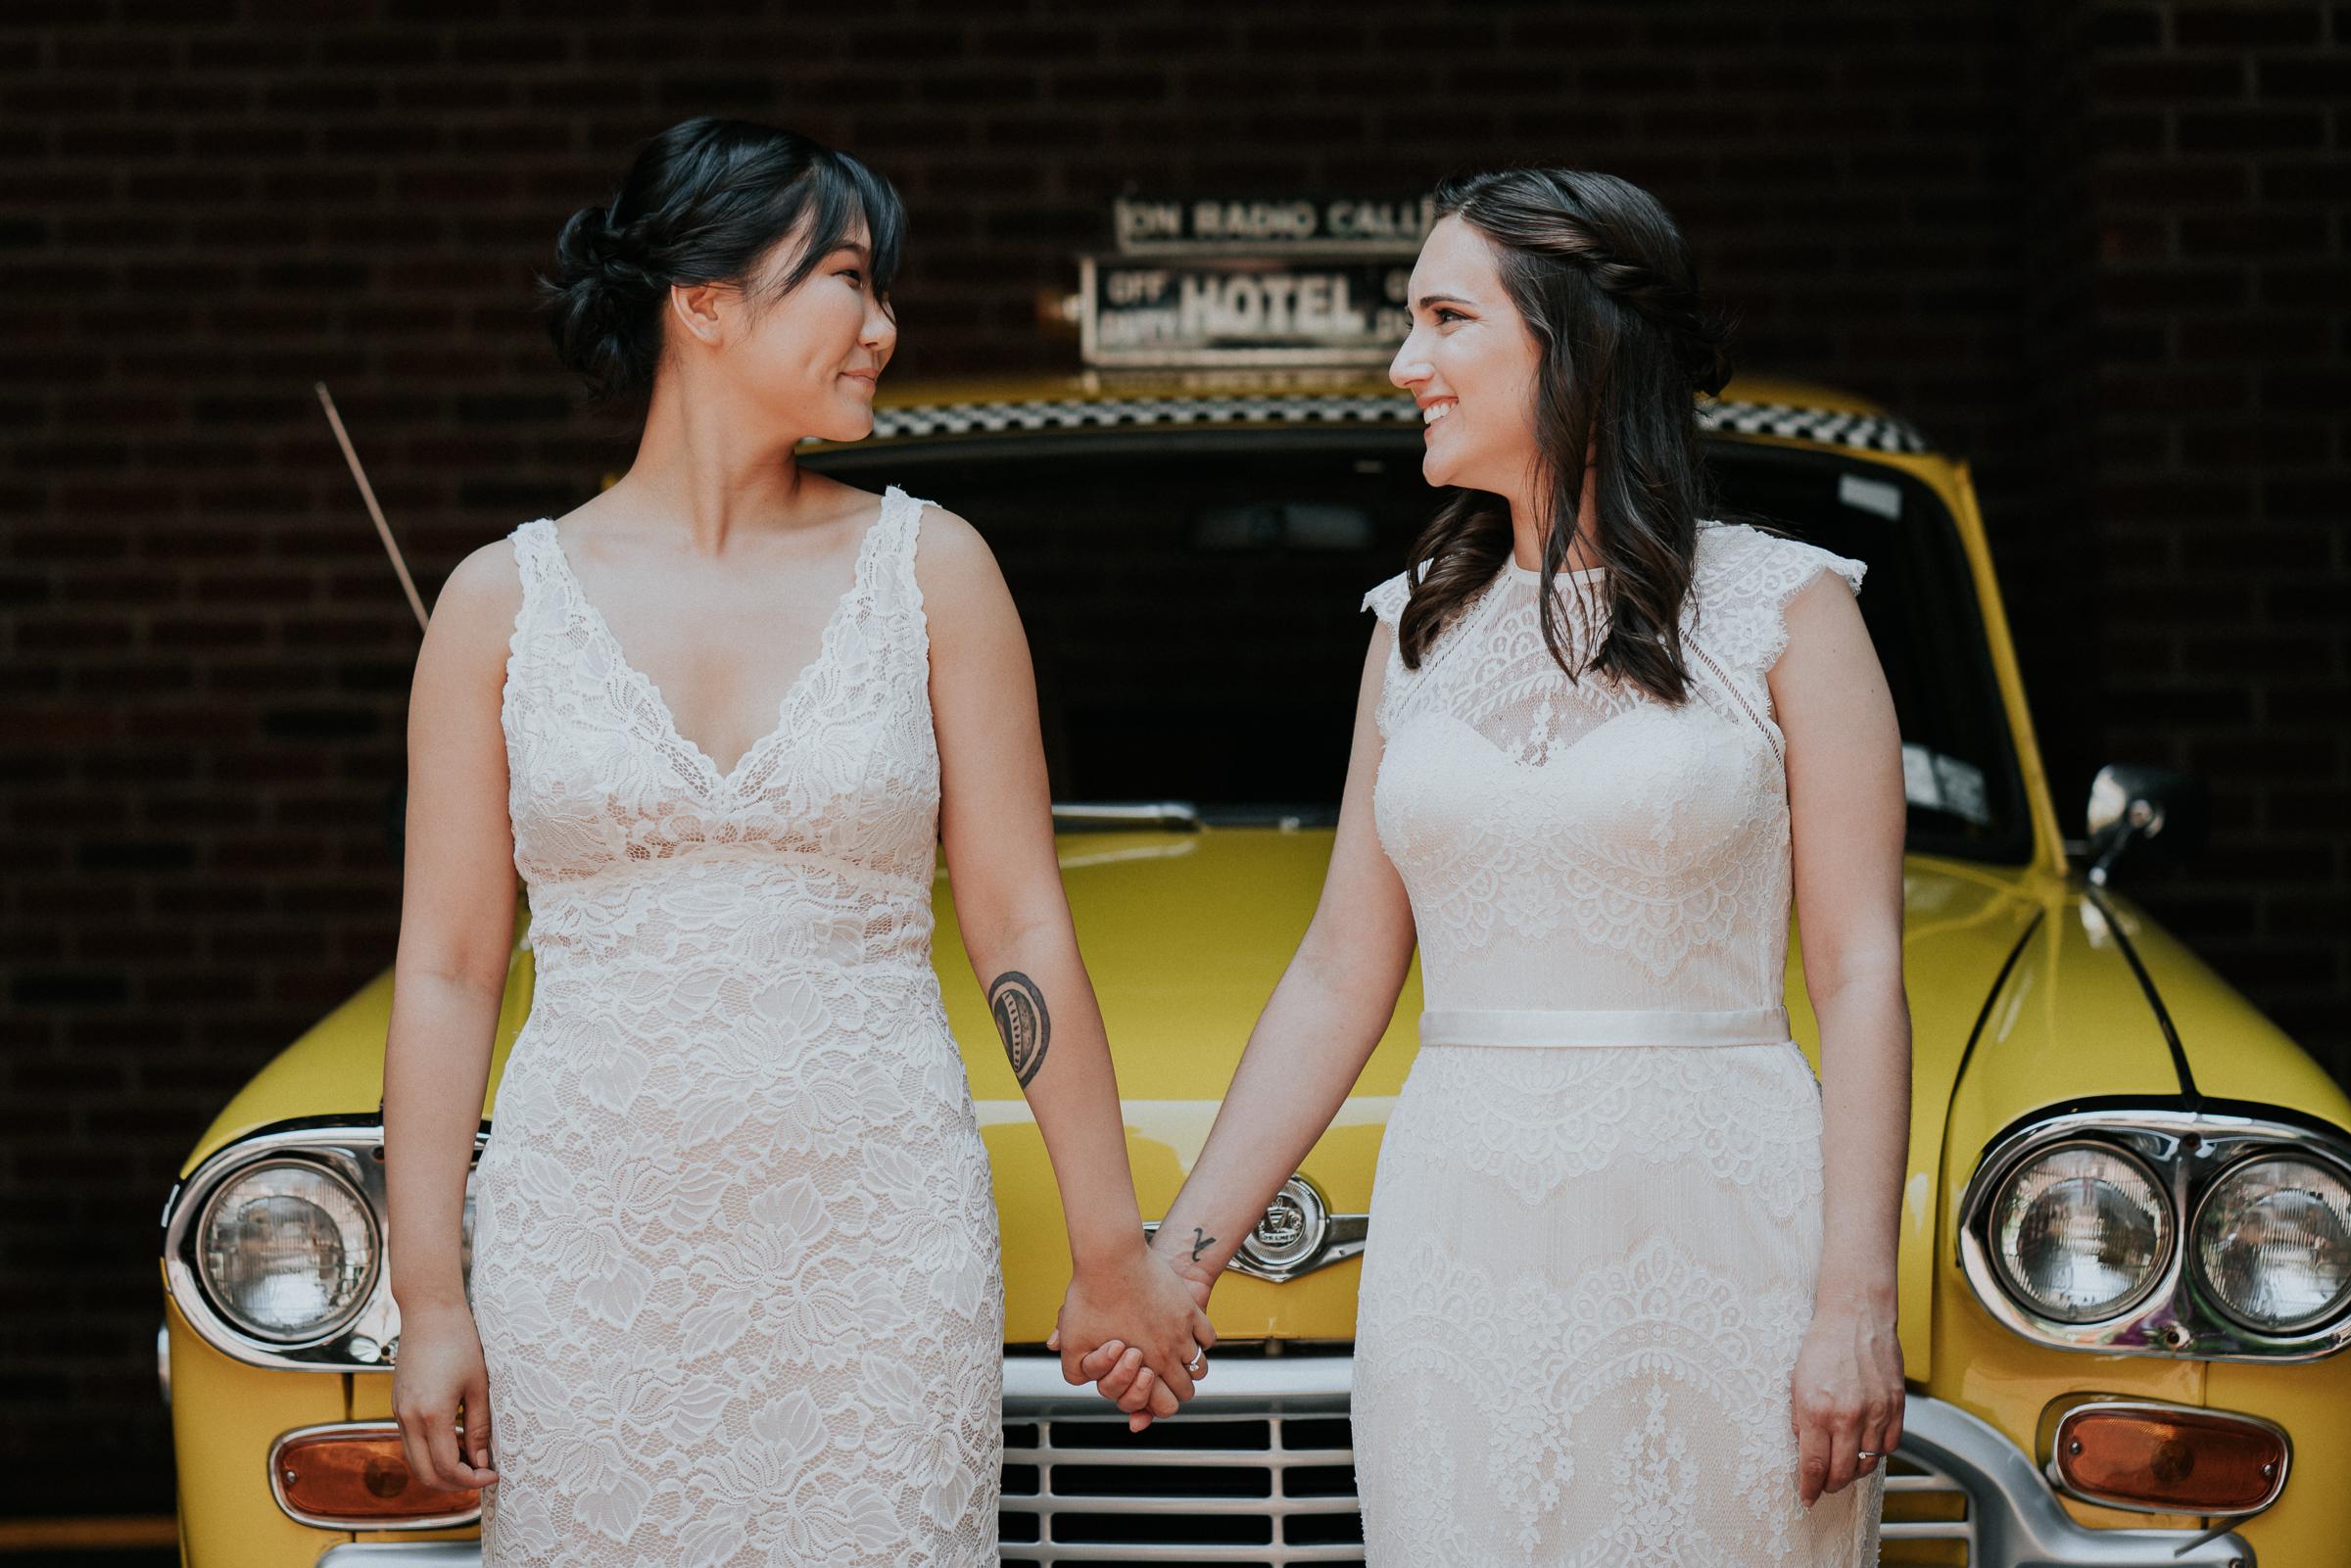 My-Moon-Brooklyn-LGBT-Gay-Documentary-Wedding-Photographer-27.jpg